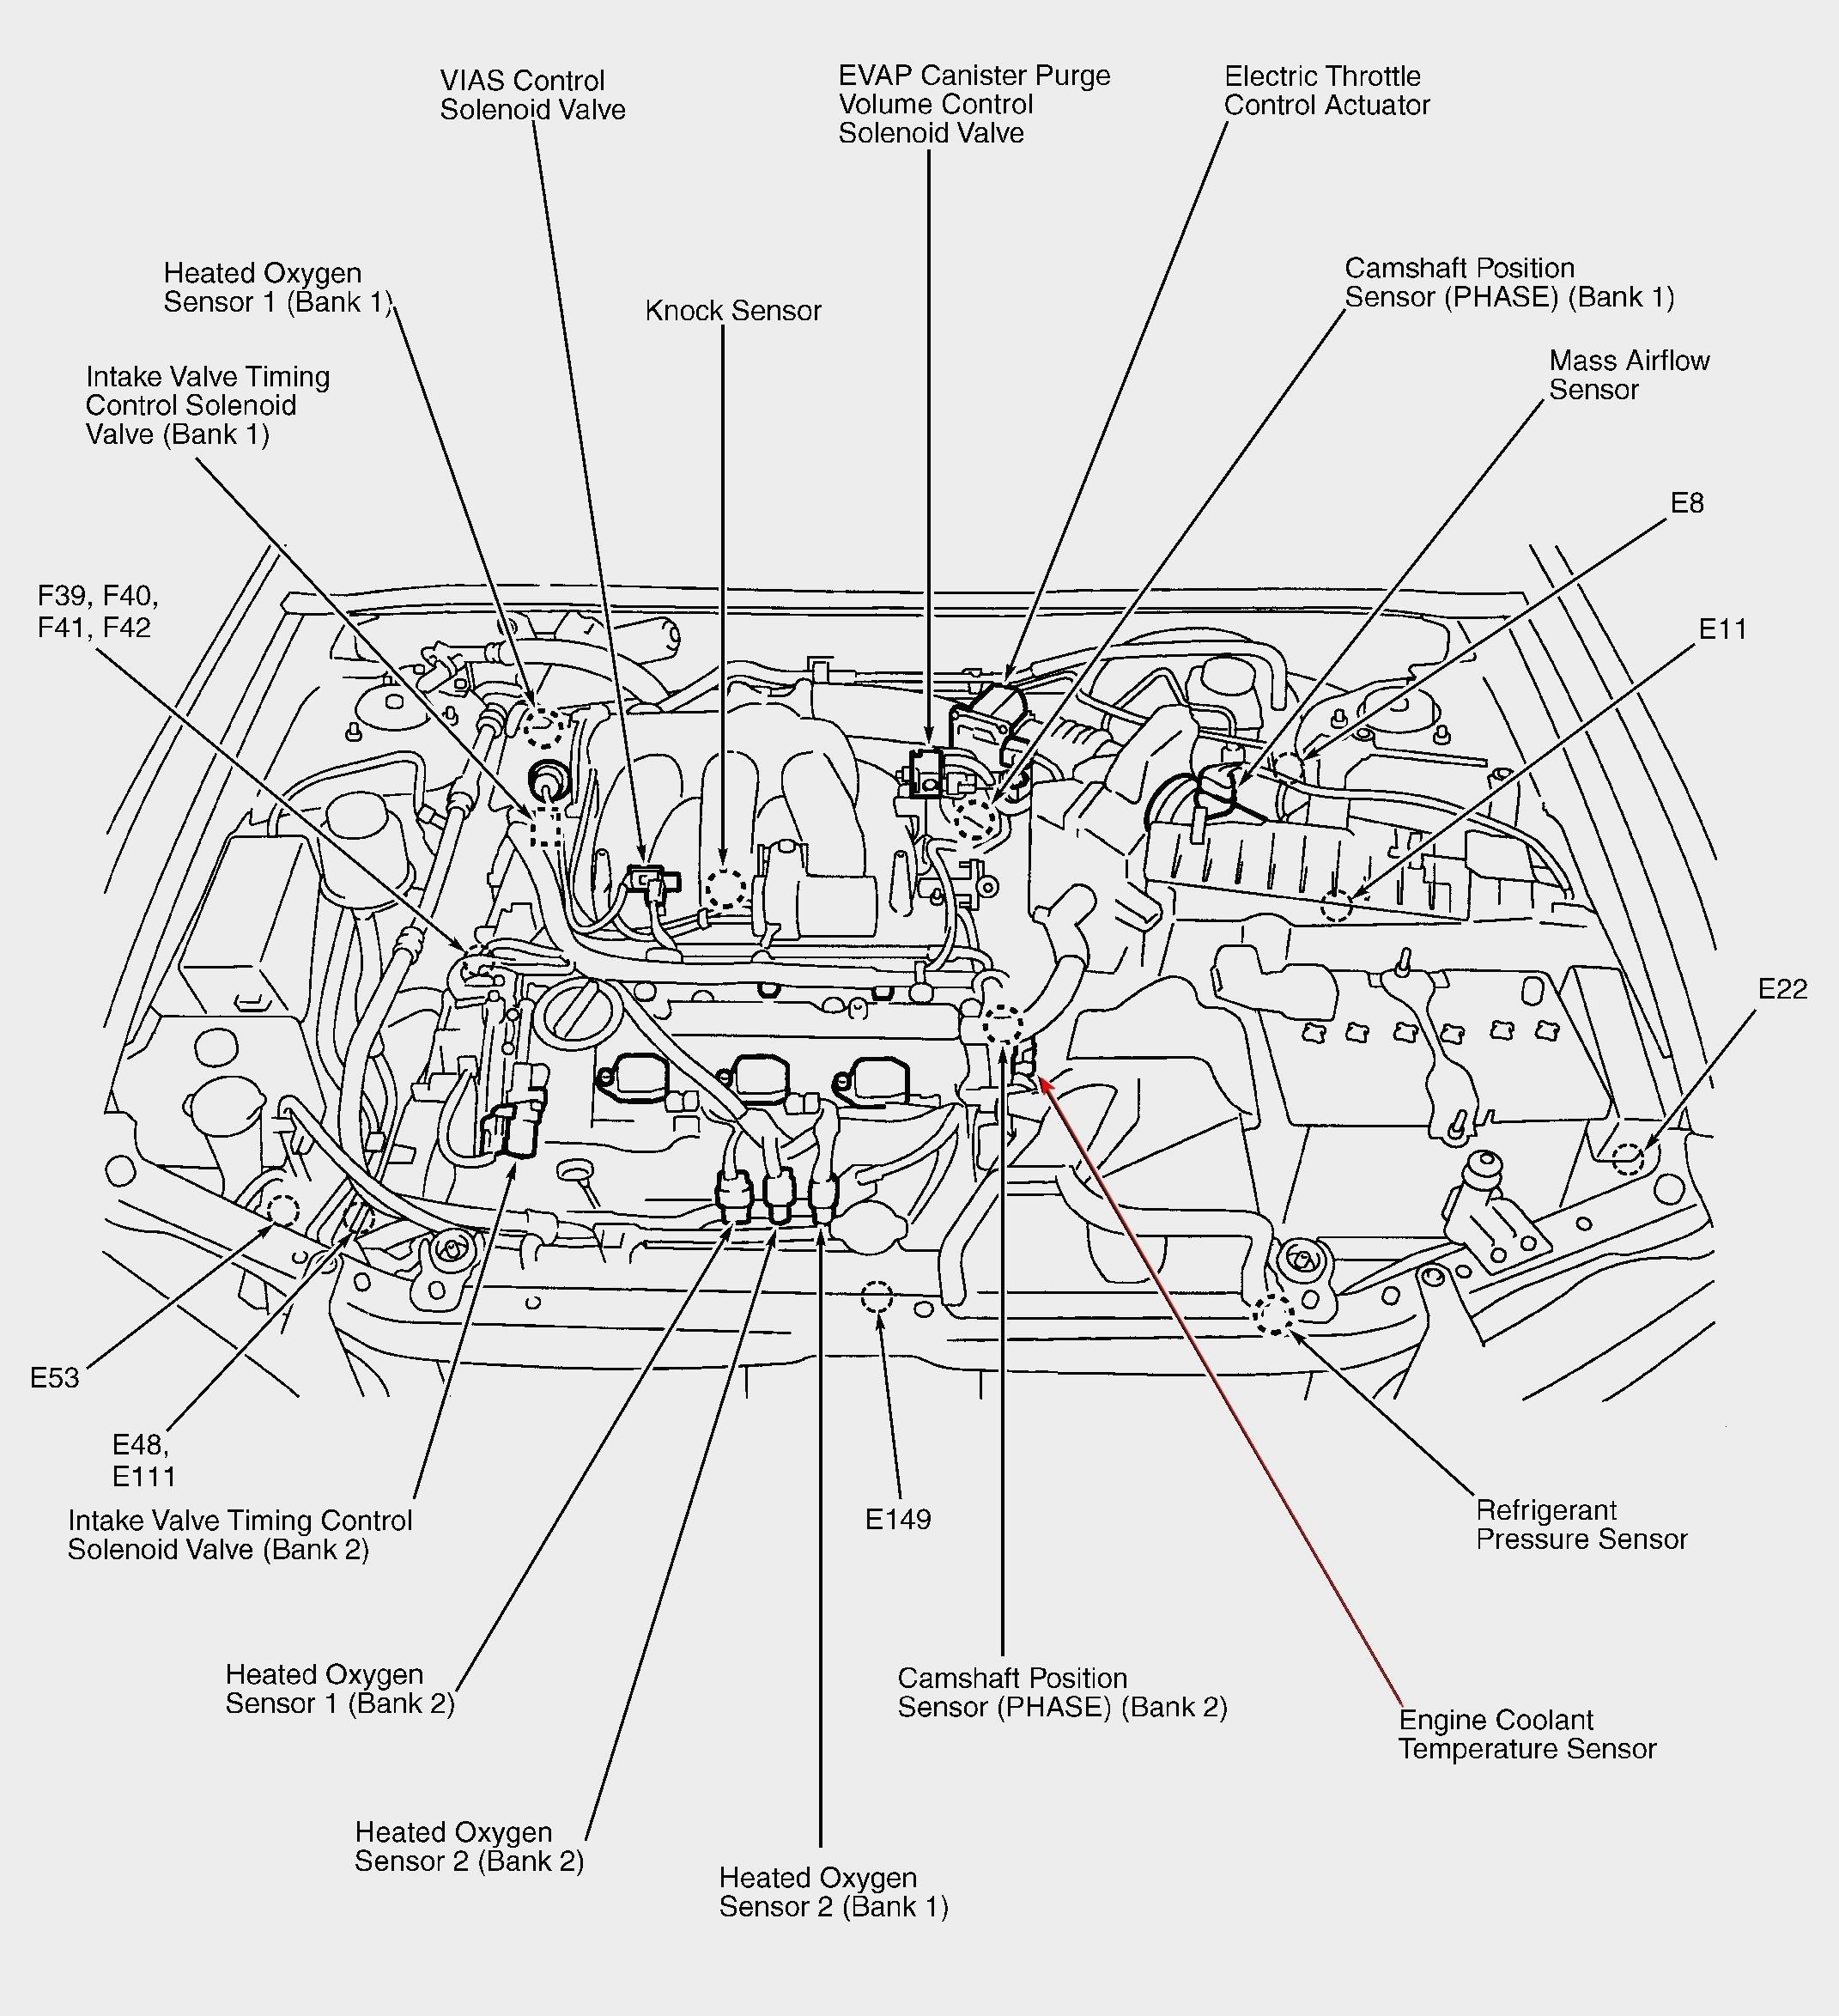 Labelled Diagram Of Car Parts Saab Usa Parts Of Labelled Diagram Of Car Parts